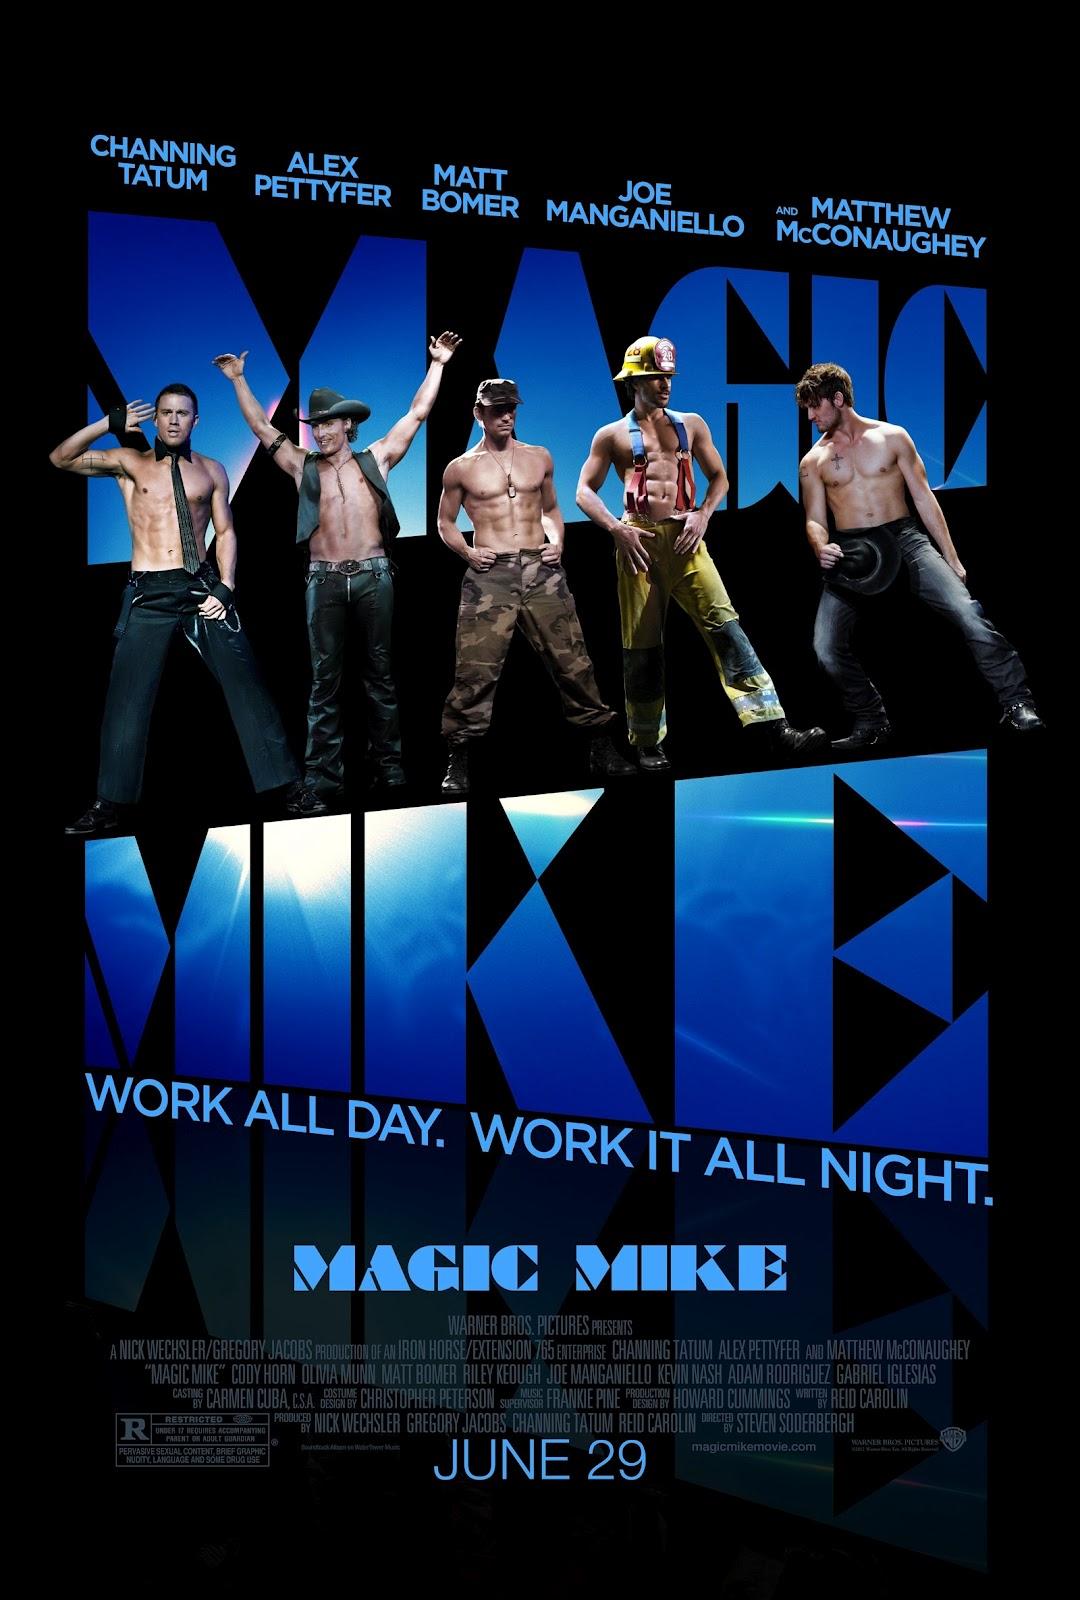 http://4.bp.blogspot.com/-BUSRleq8ADQ/UDh4ChCrUDI/AAAAAAAAR_s/Bzzw5uTaC2s/s1600/magicmike+poster.jpg